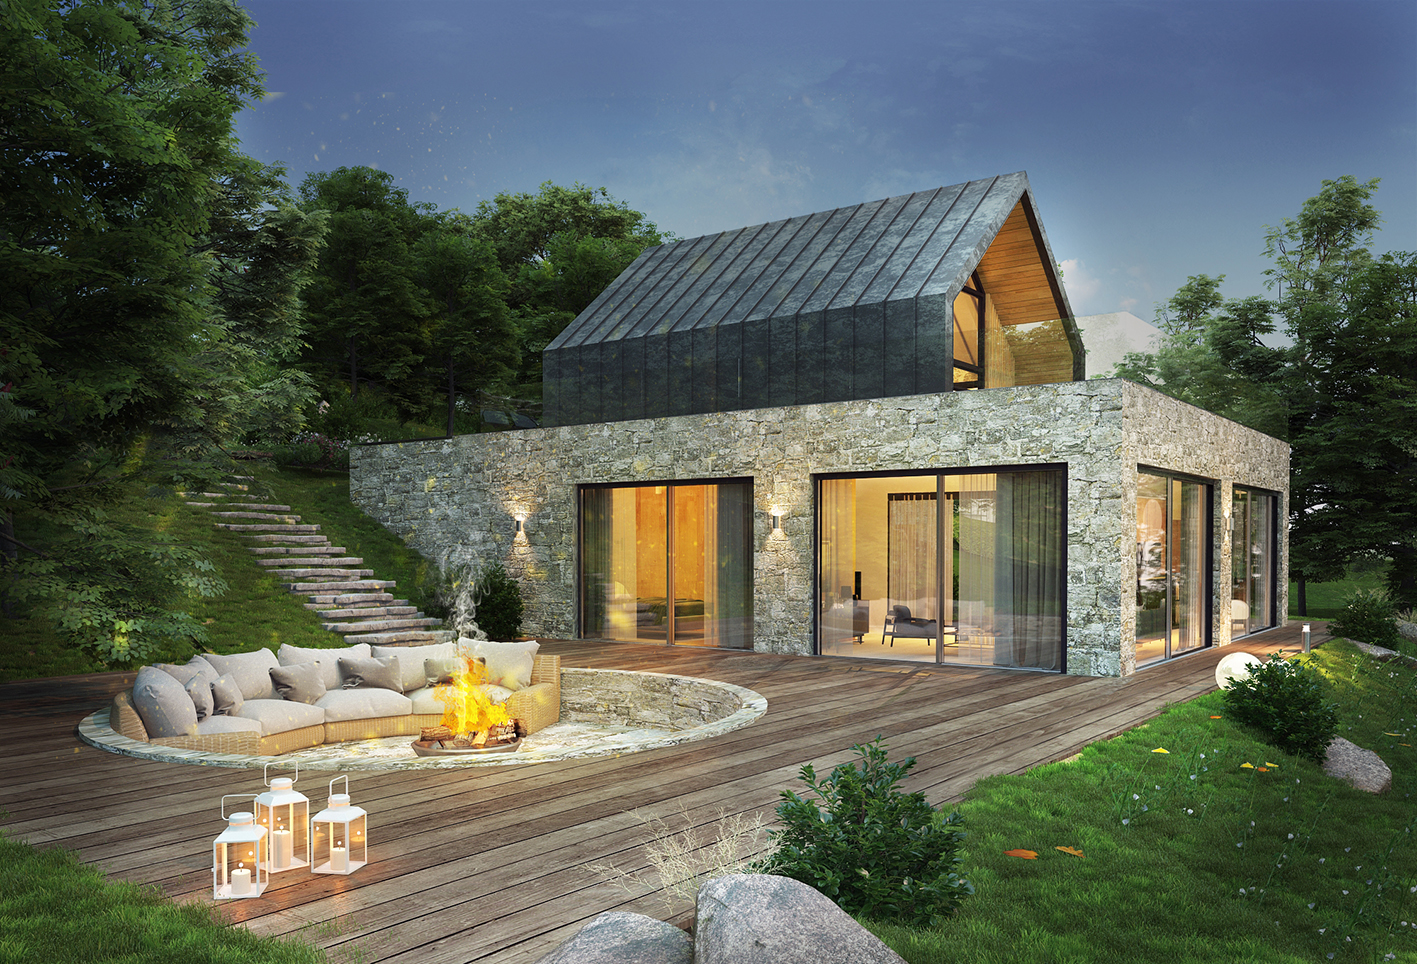 kuće koje nam se sviđaju.. - Page 5 Forest-house-modern-hills-architecture-beautiful-nature